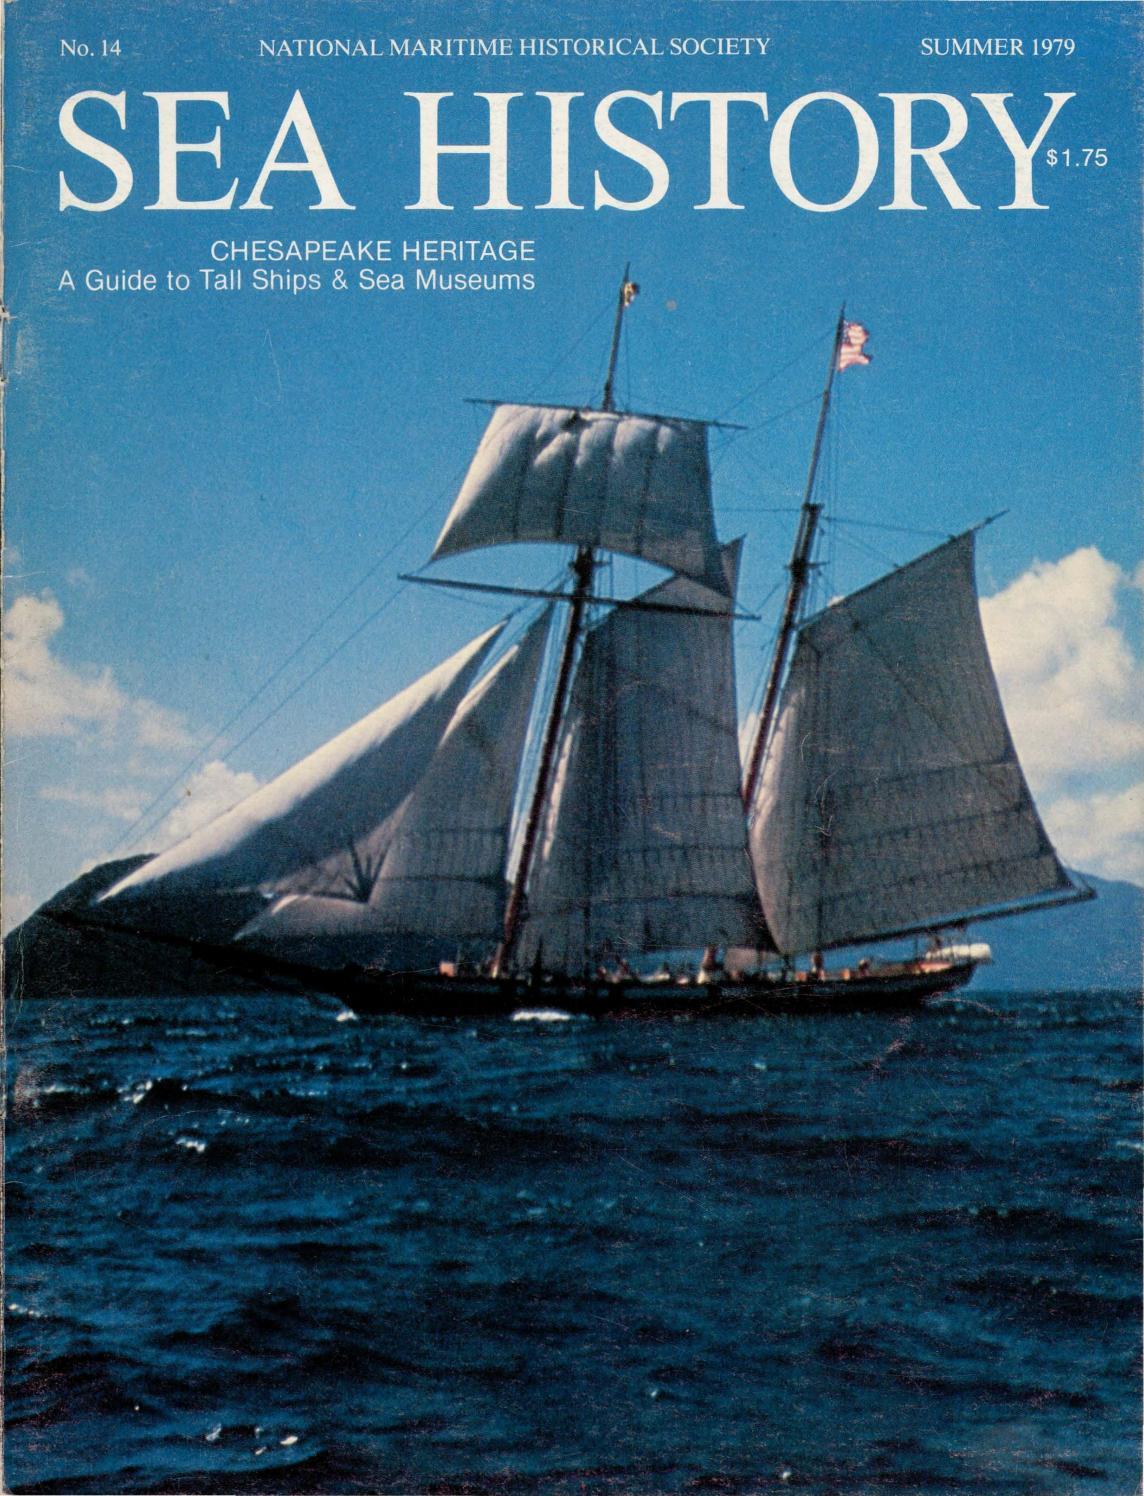 7742b0ffac Sea History 014 - Summer 1979 by National Maritime Historical ...